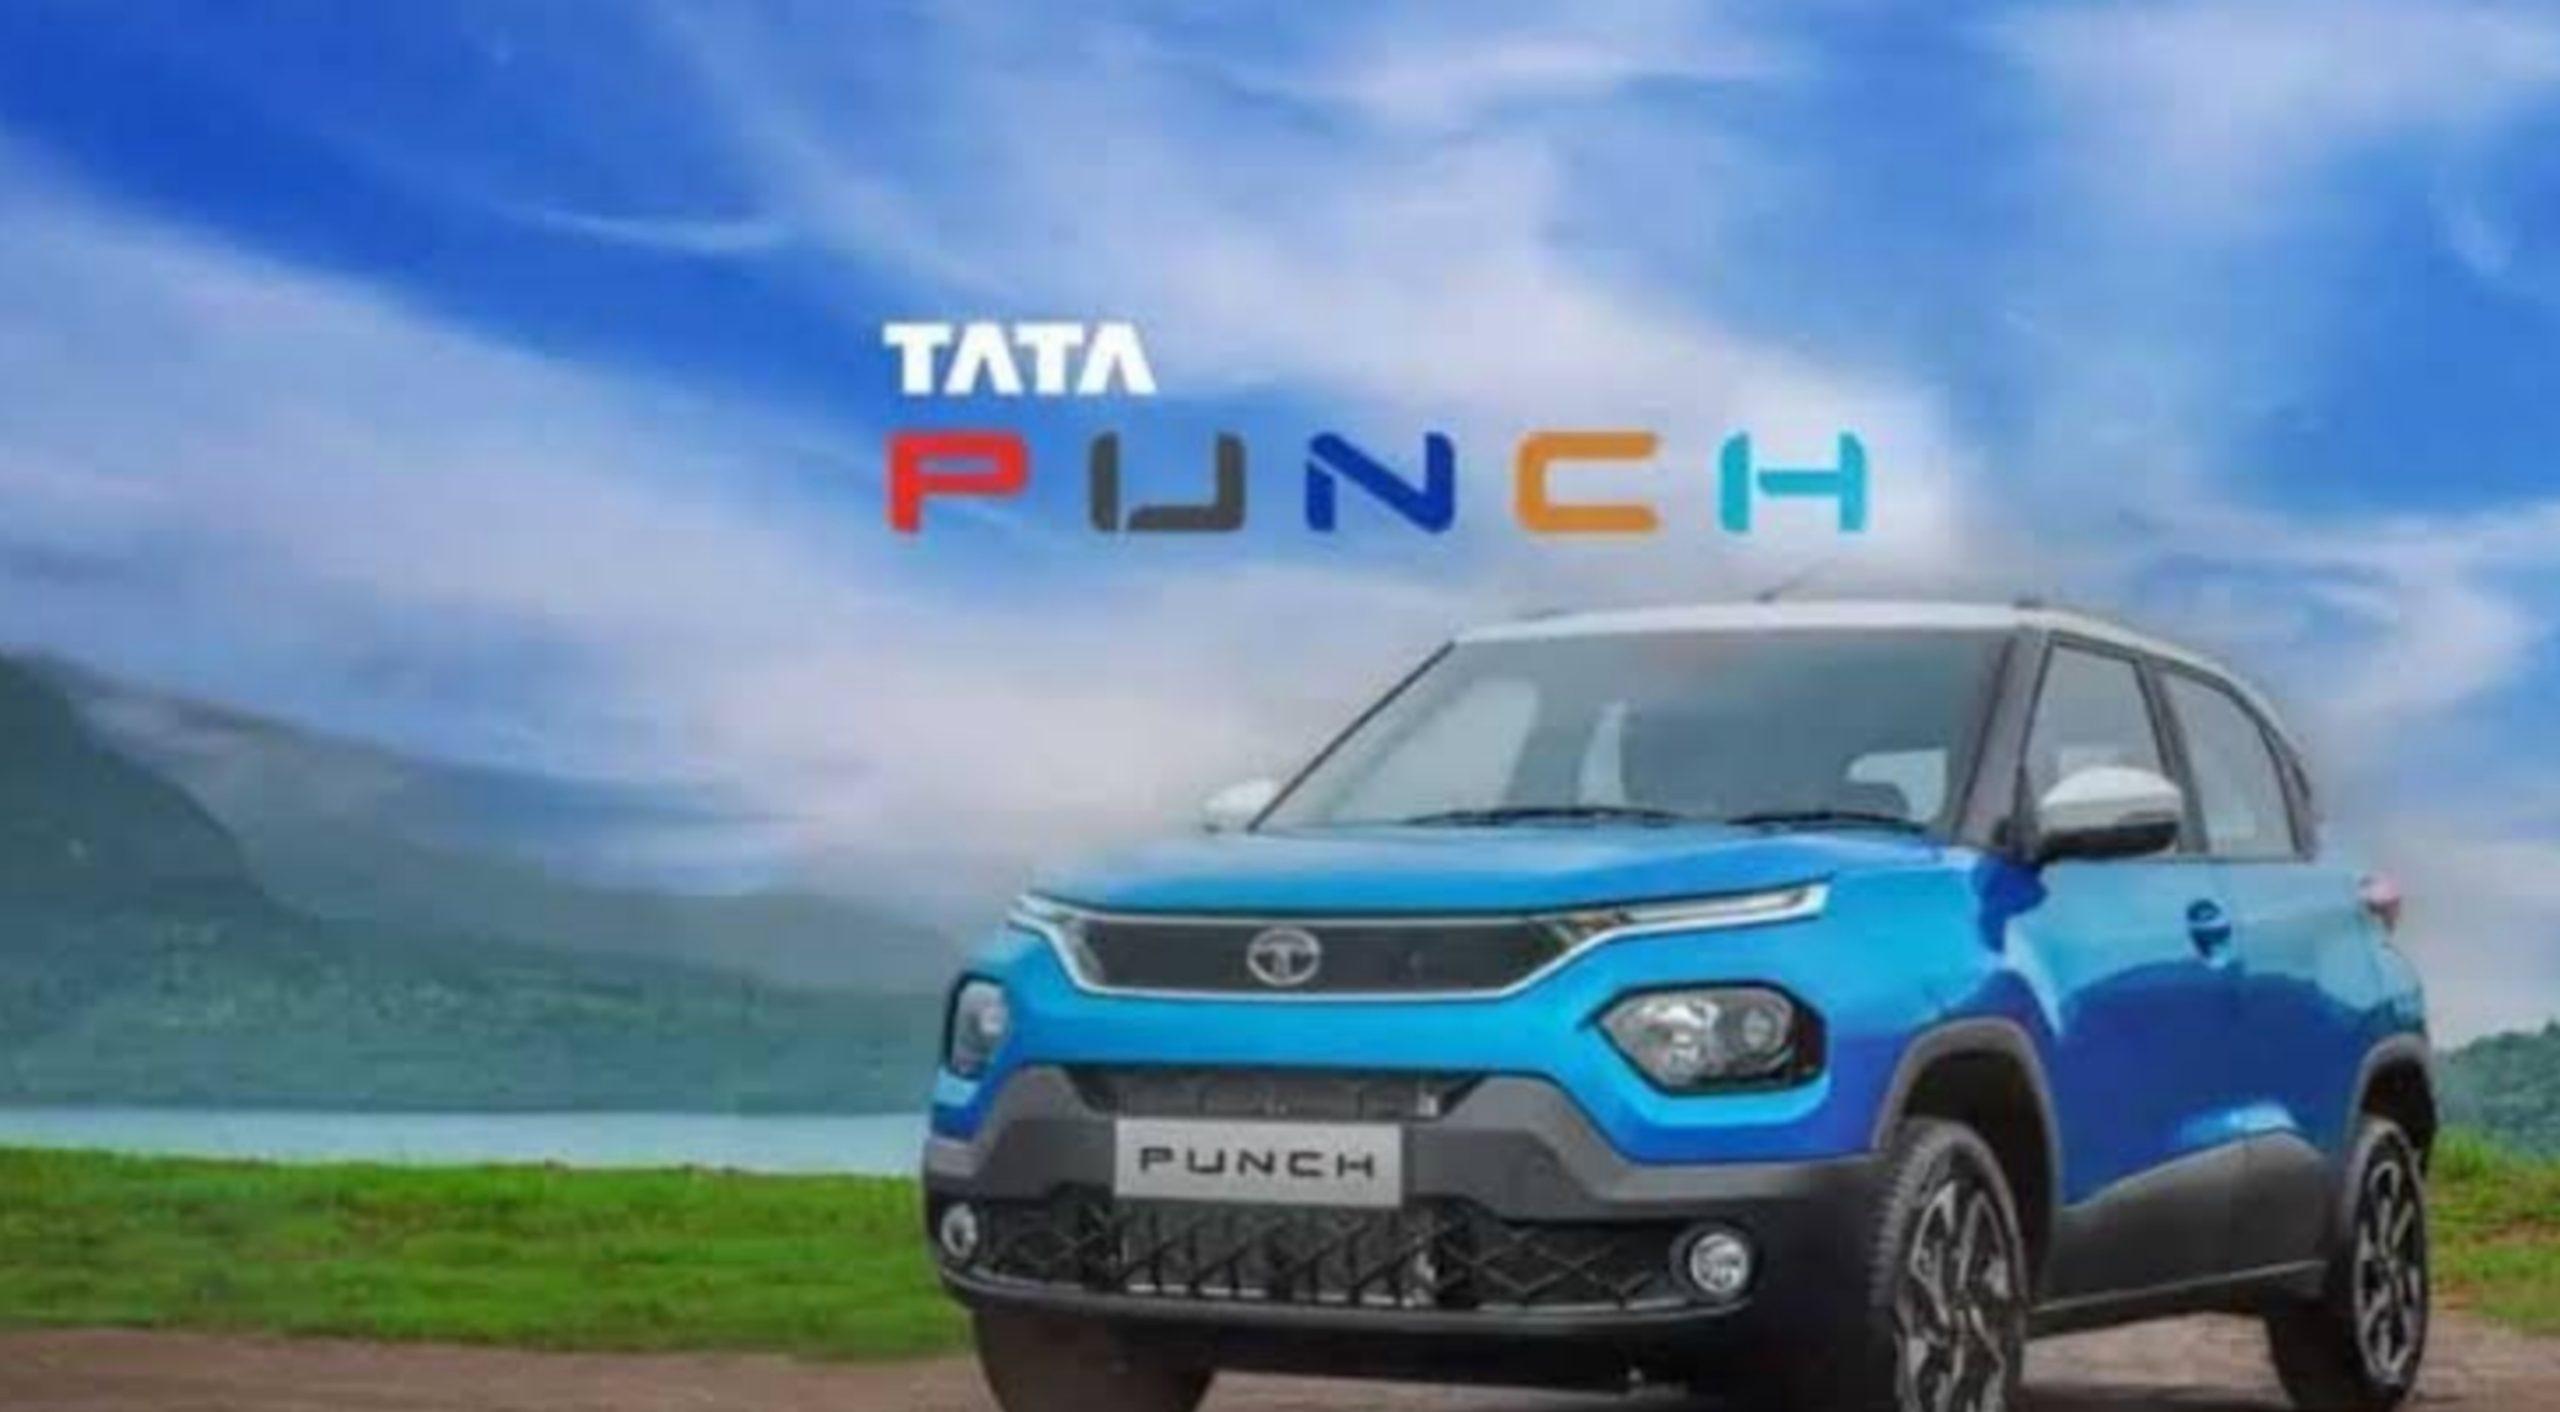 Tata Punch